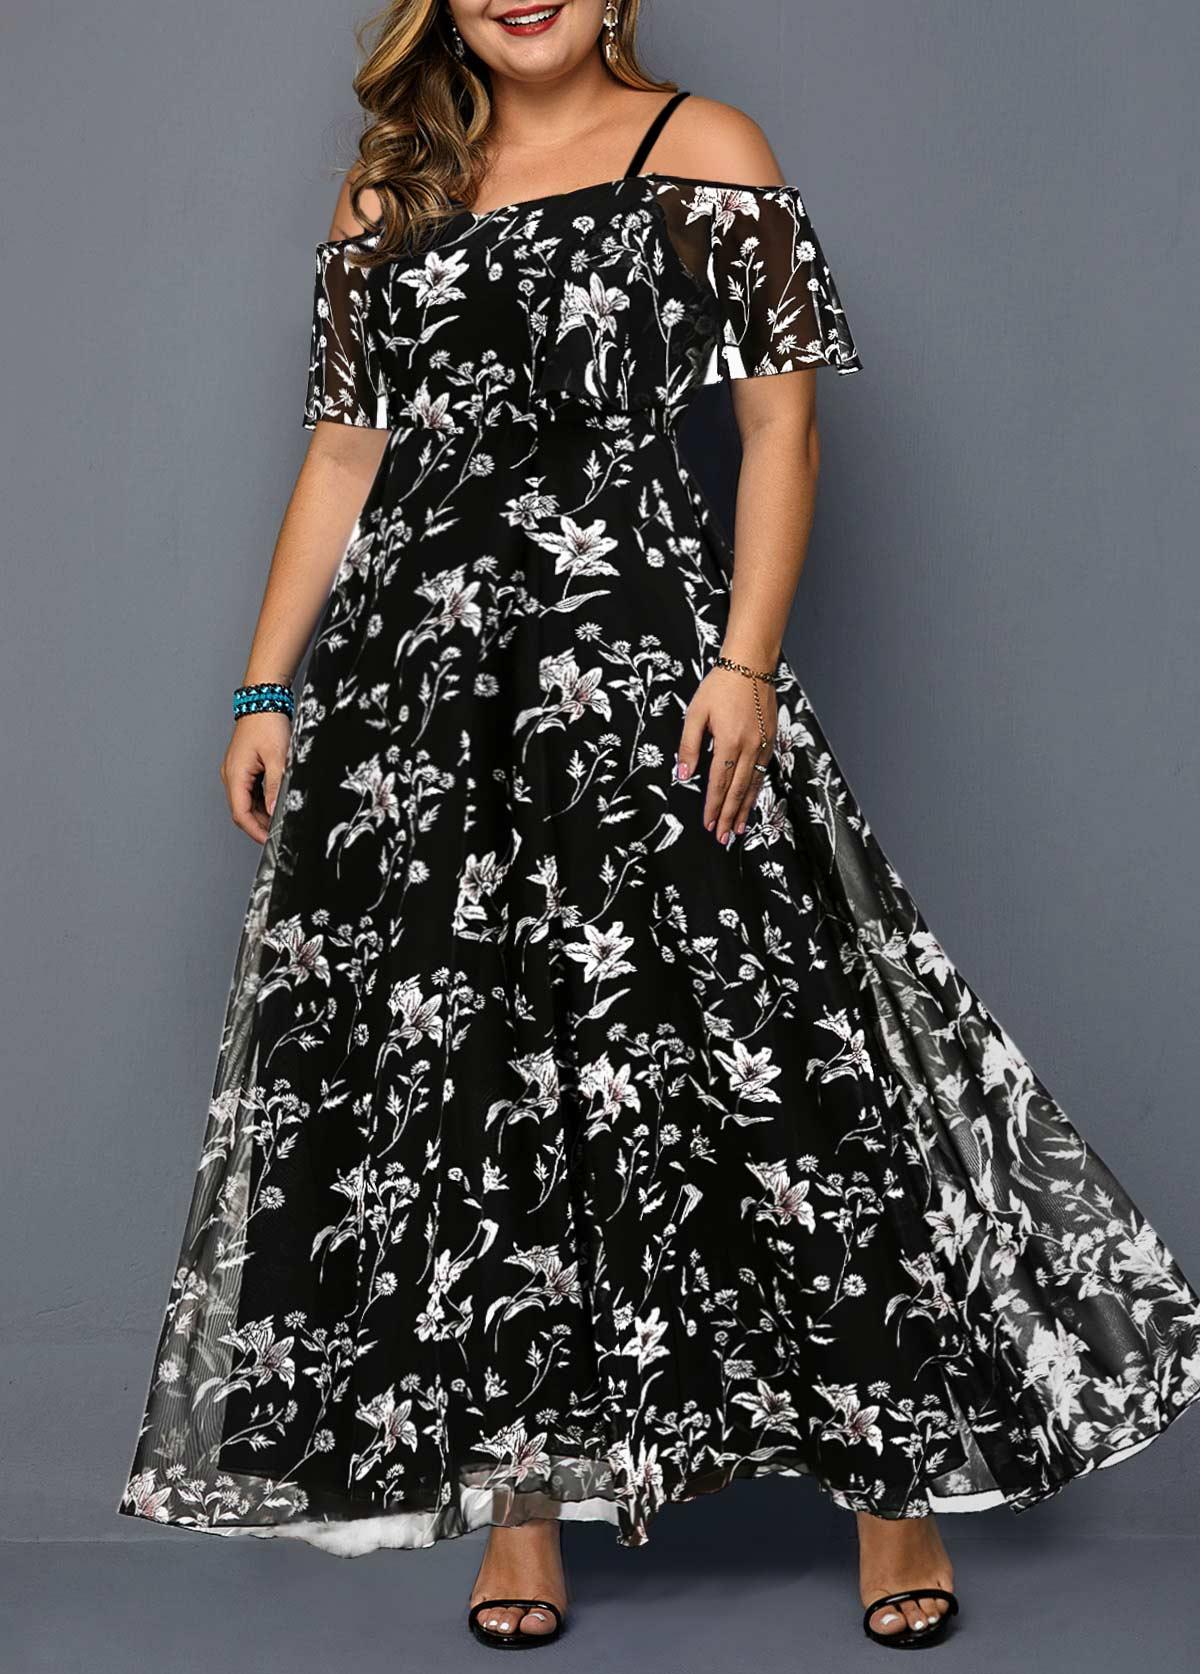 Plus Size Black Prined Strappy Cold Shoulder Dress